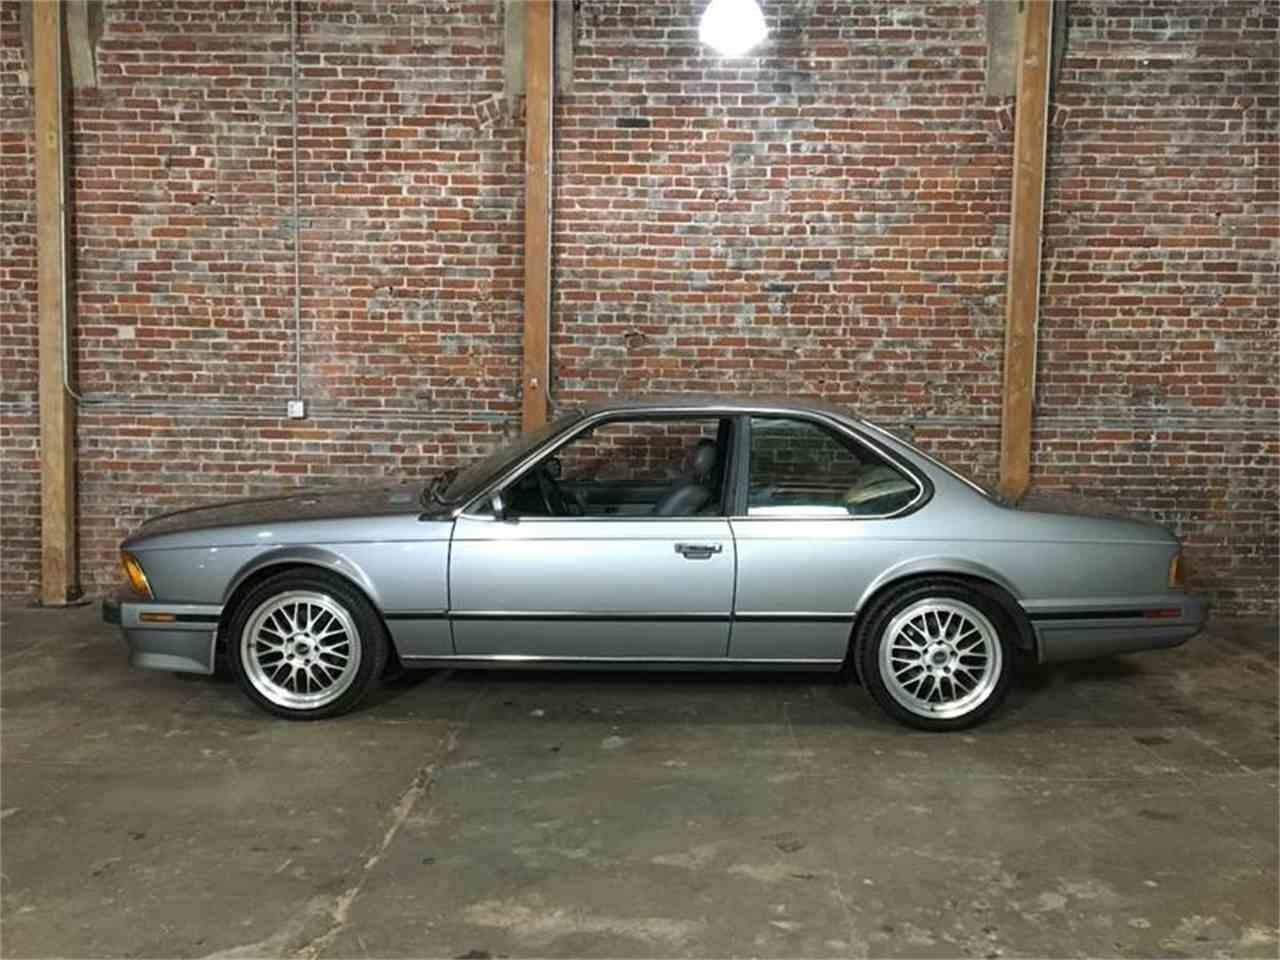 BMW Series For Sale ClassicCarscom CC - 1988 bmw 6 series